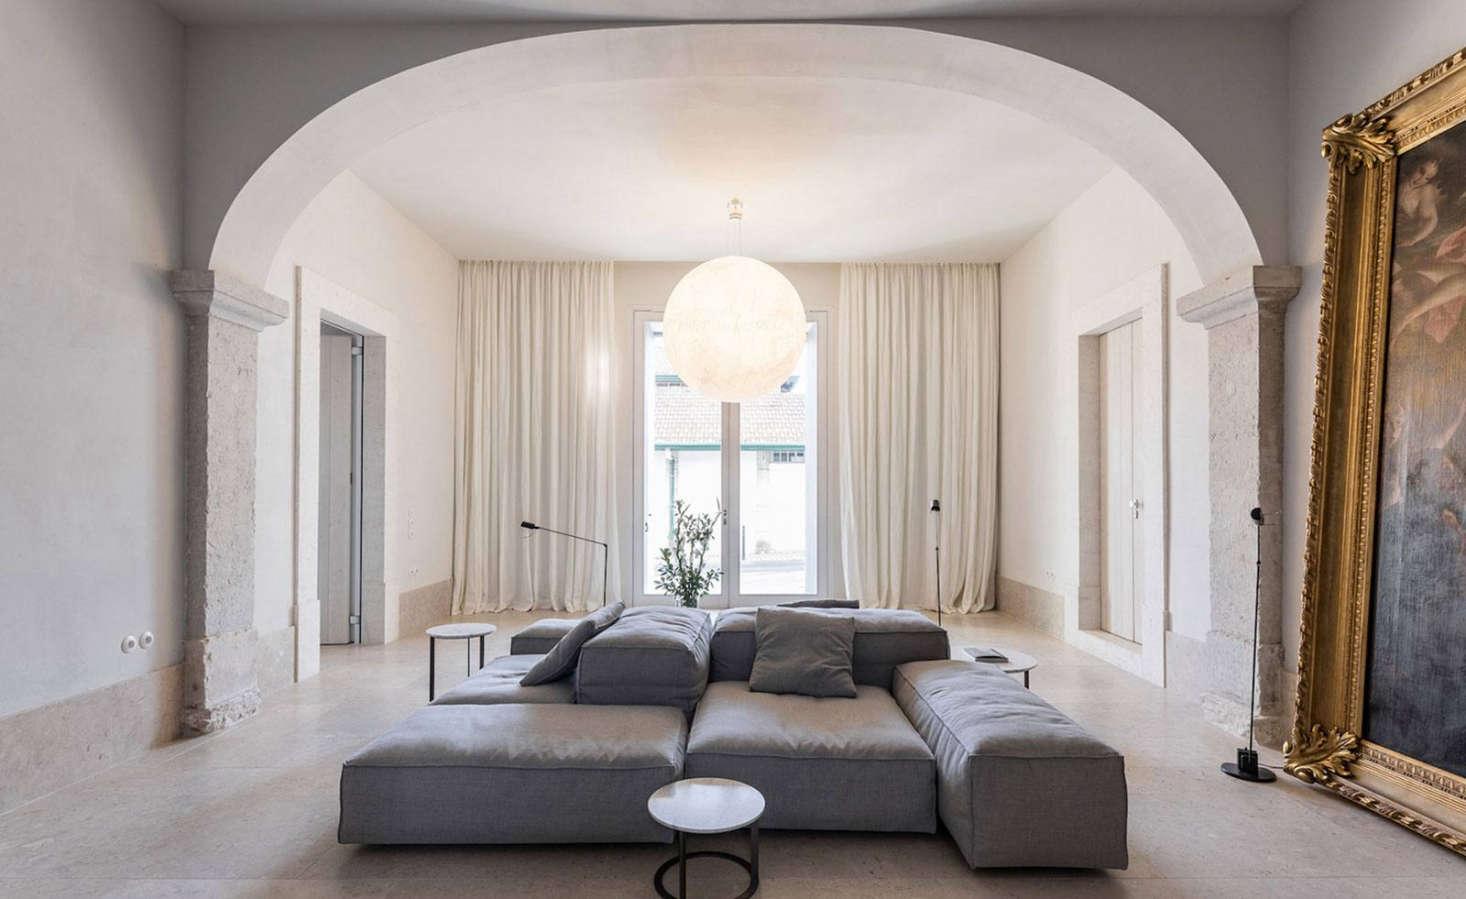 Guests enter through a grand entrance hall anchored bya Moon Pendant byItalian designer Davide Groppi.